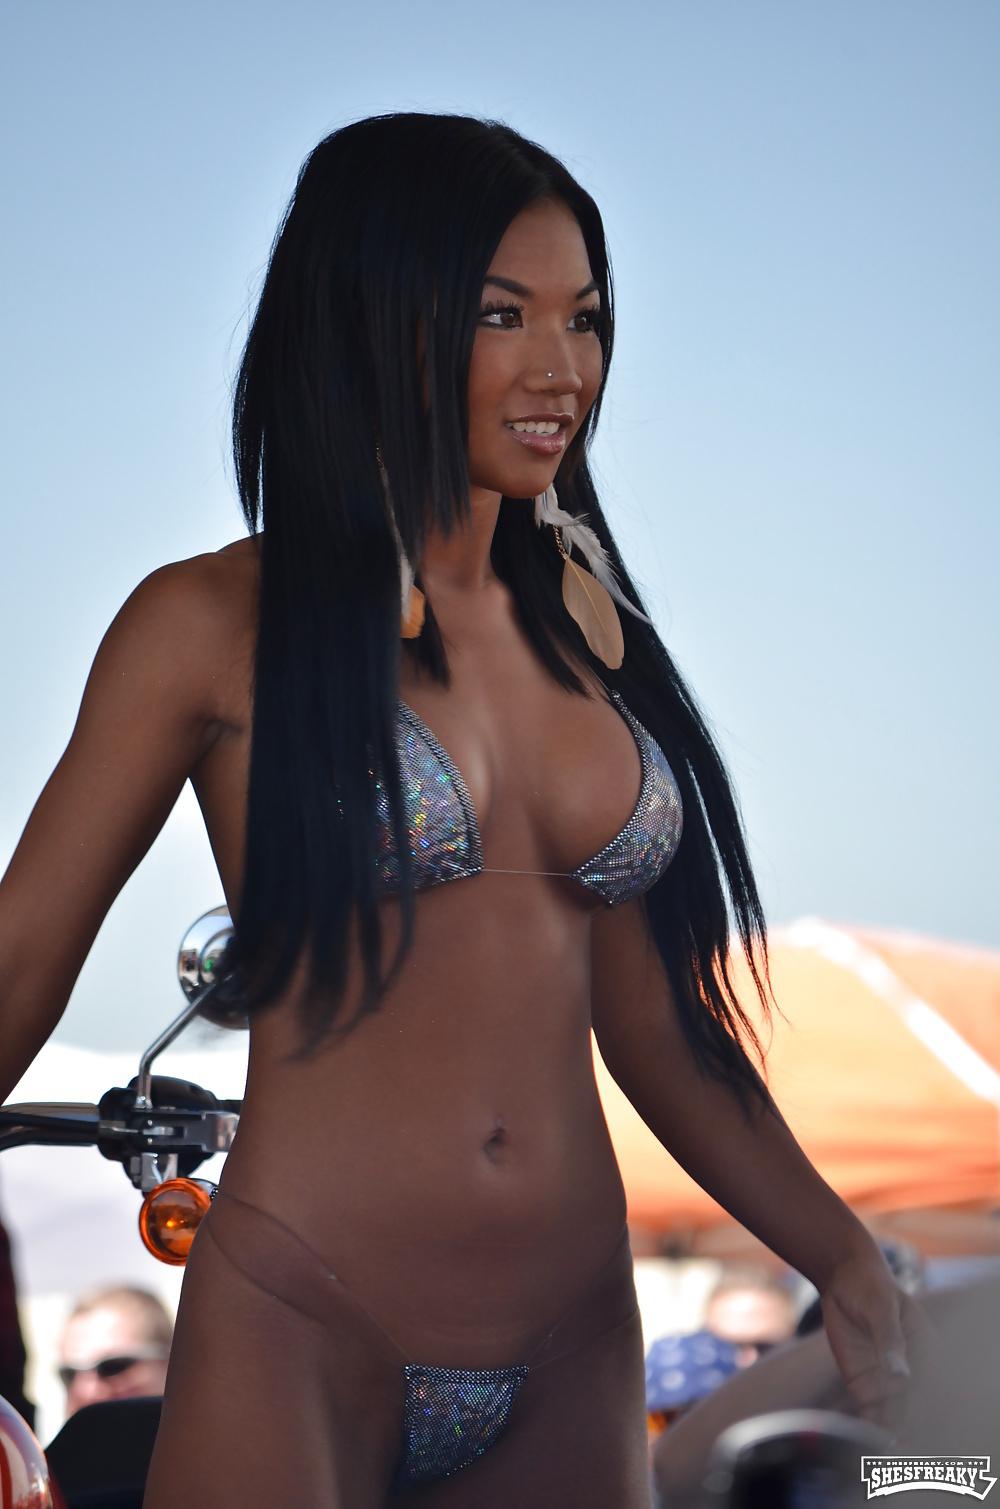 Super Hot Asian- Tina- Bikini- Lbfm - Shesfreaky-3587